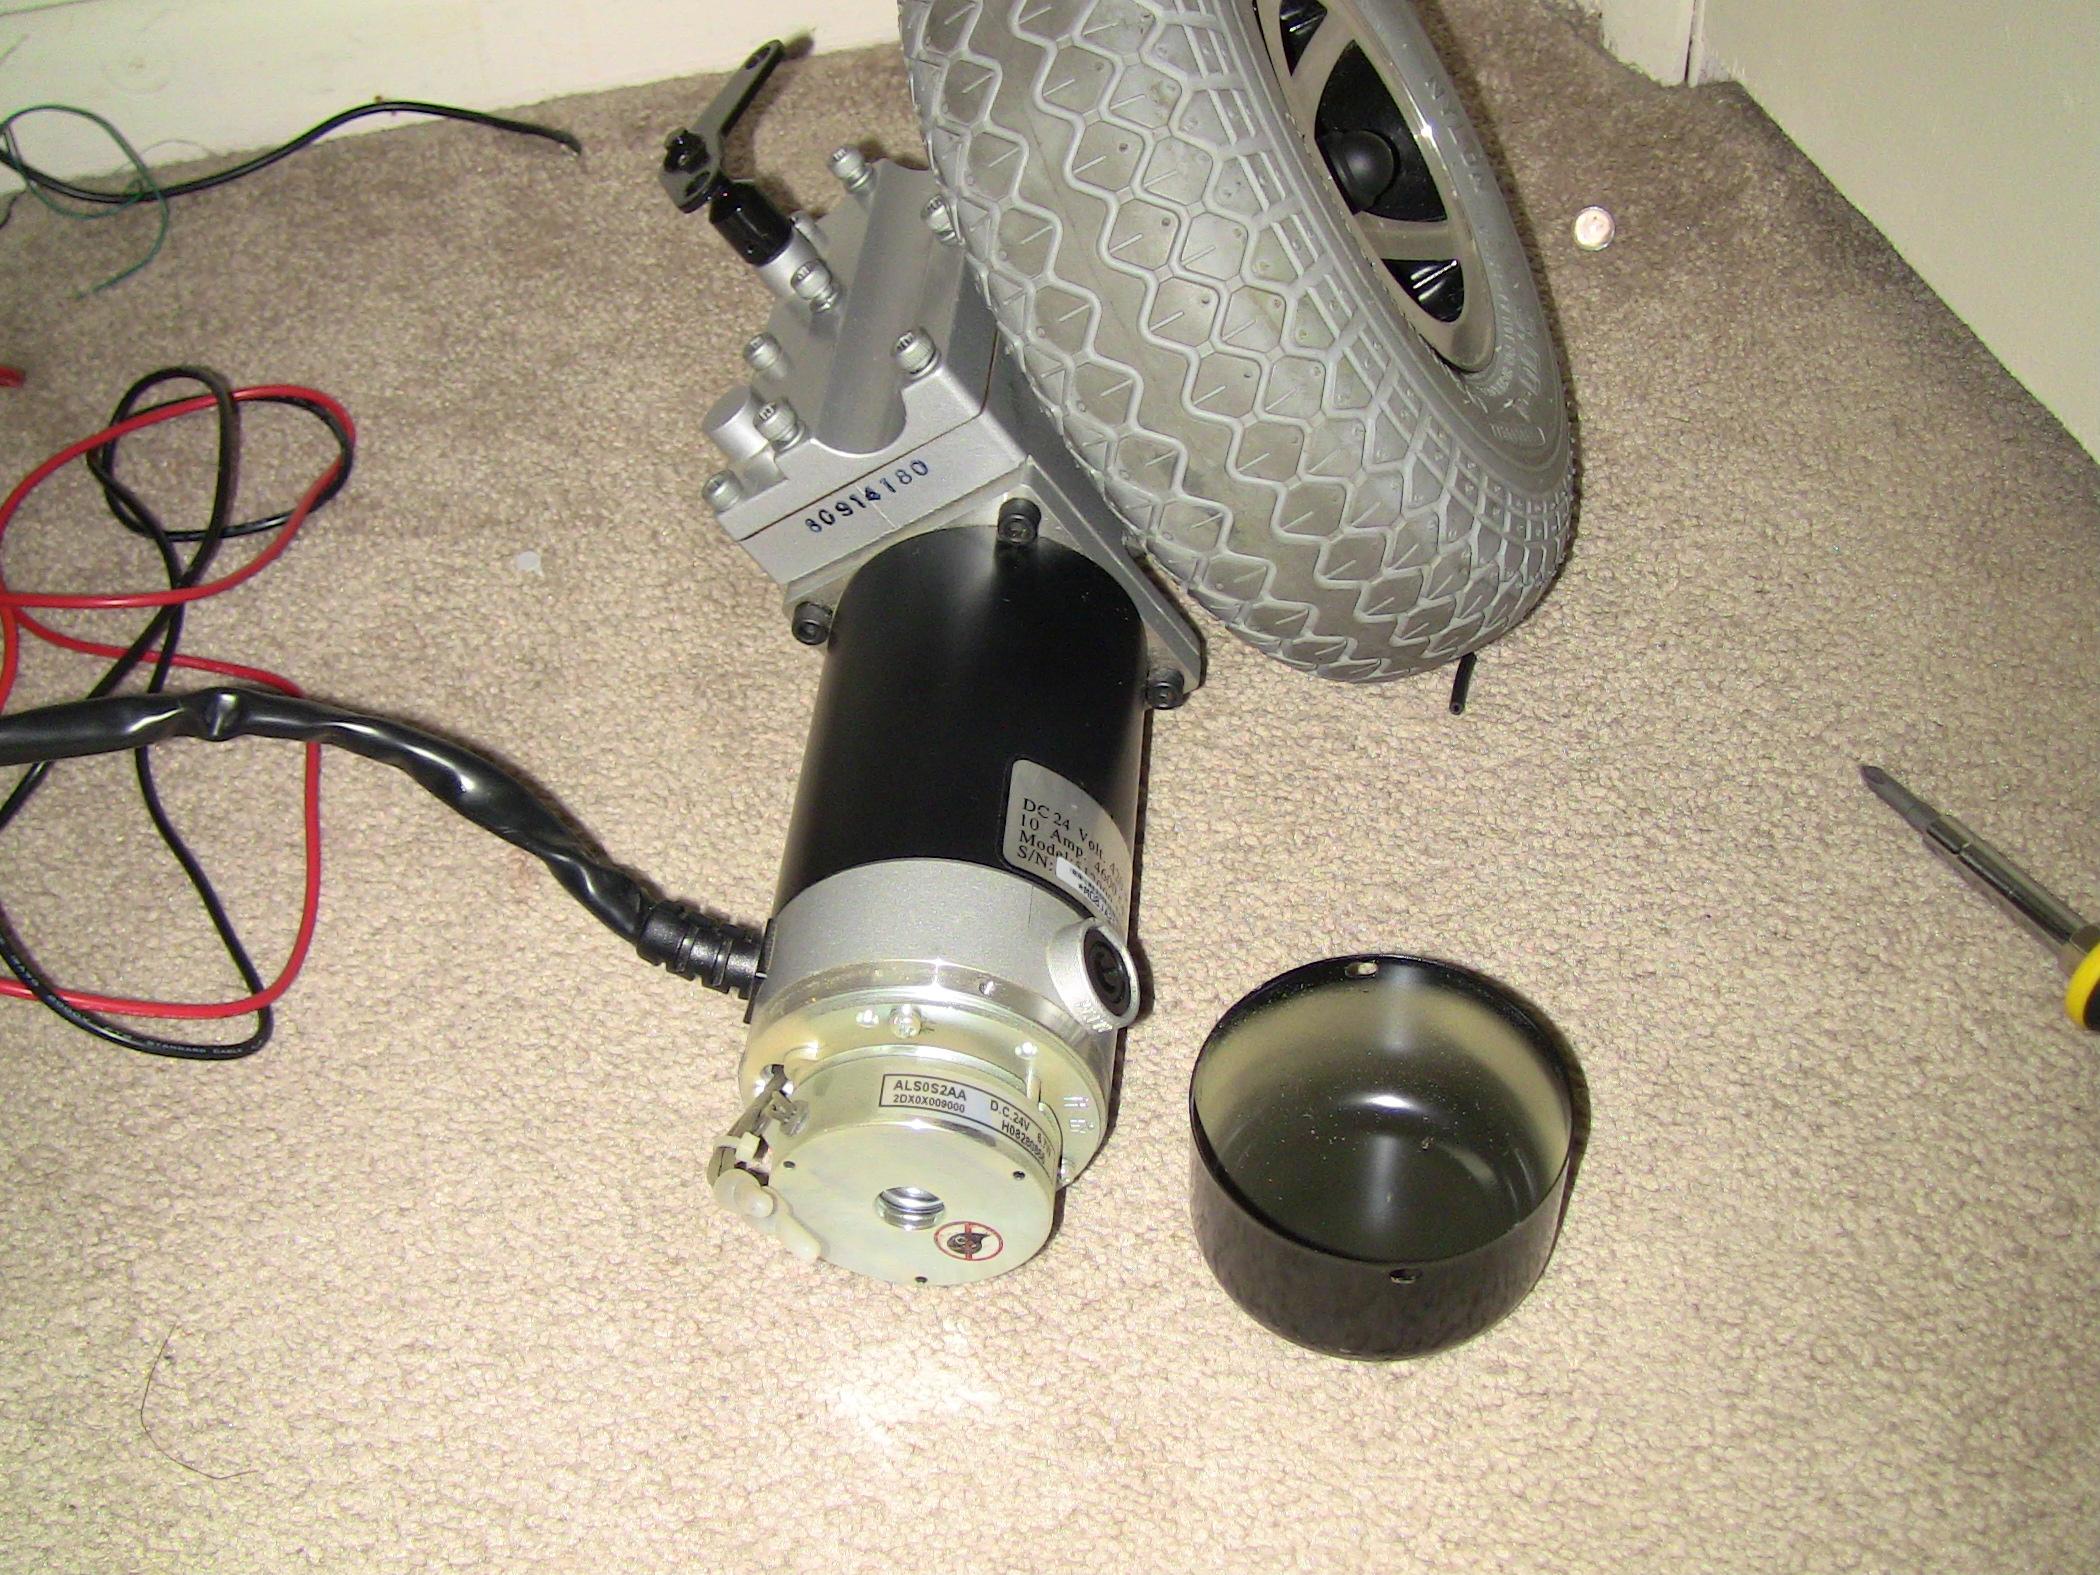 24VDC Wheelchair Motor Help Electronics Forum Circuits